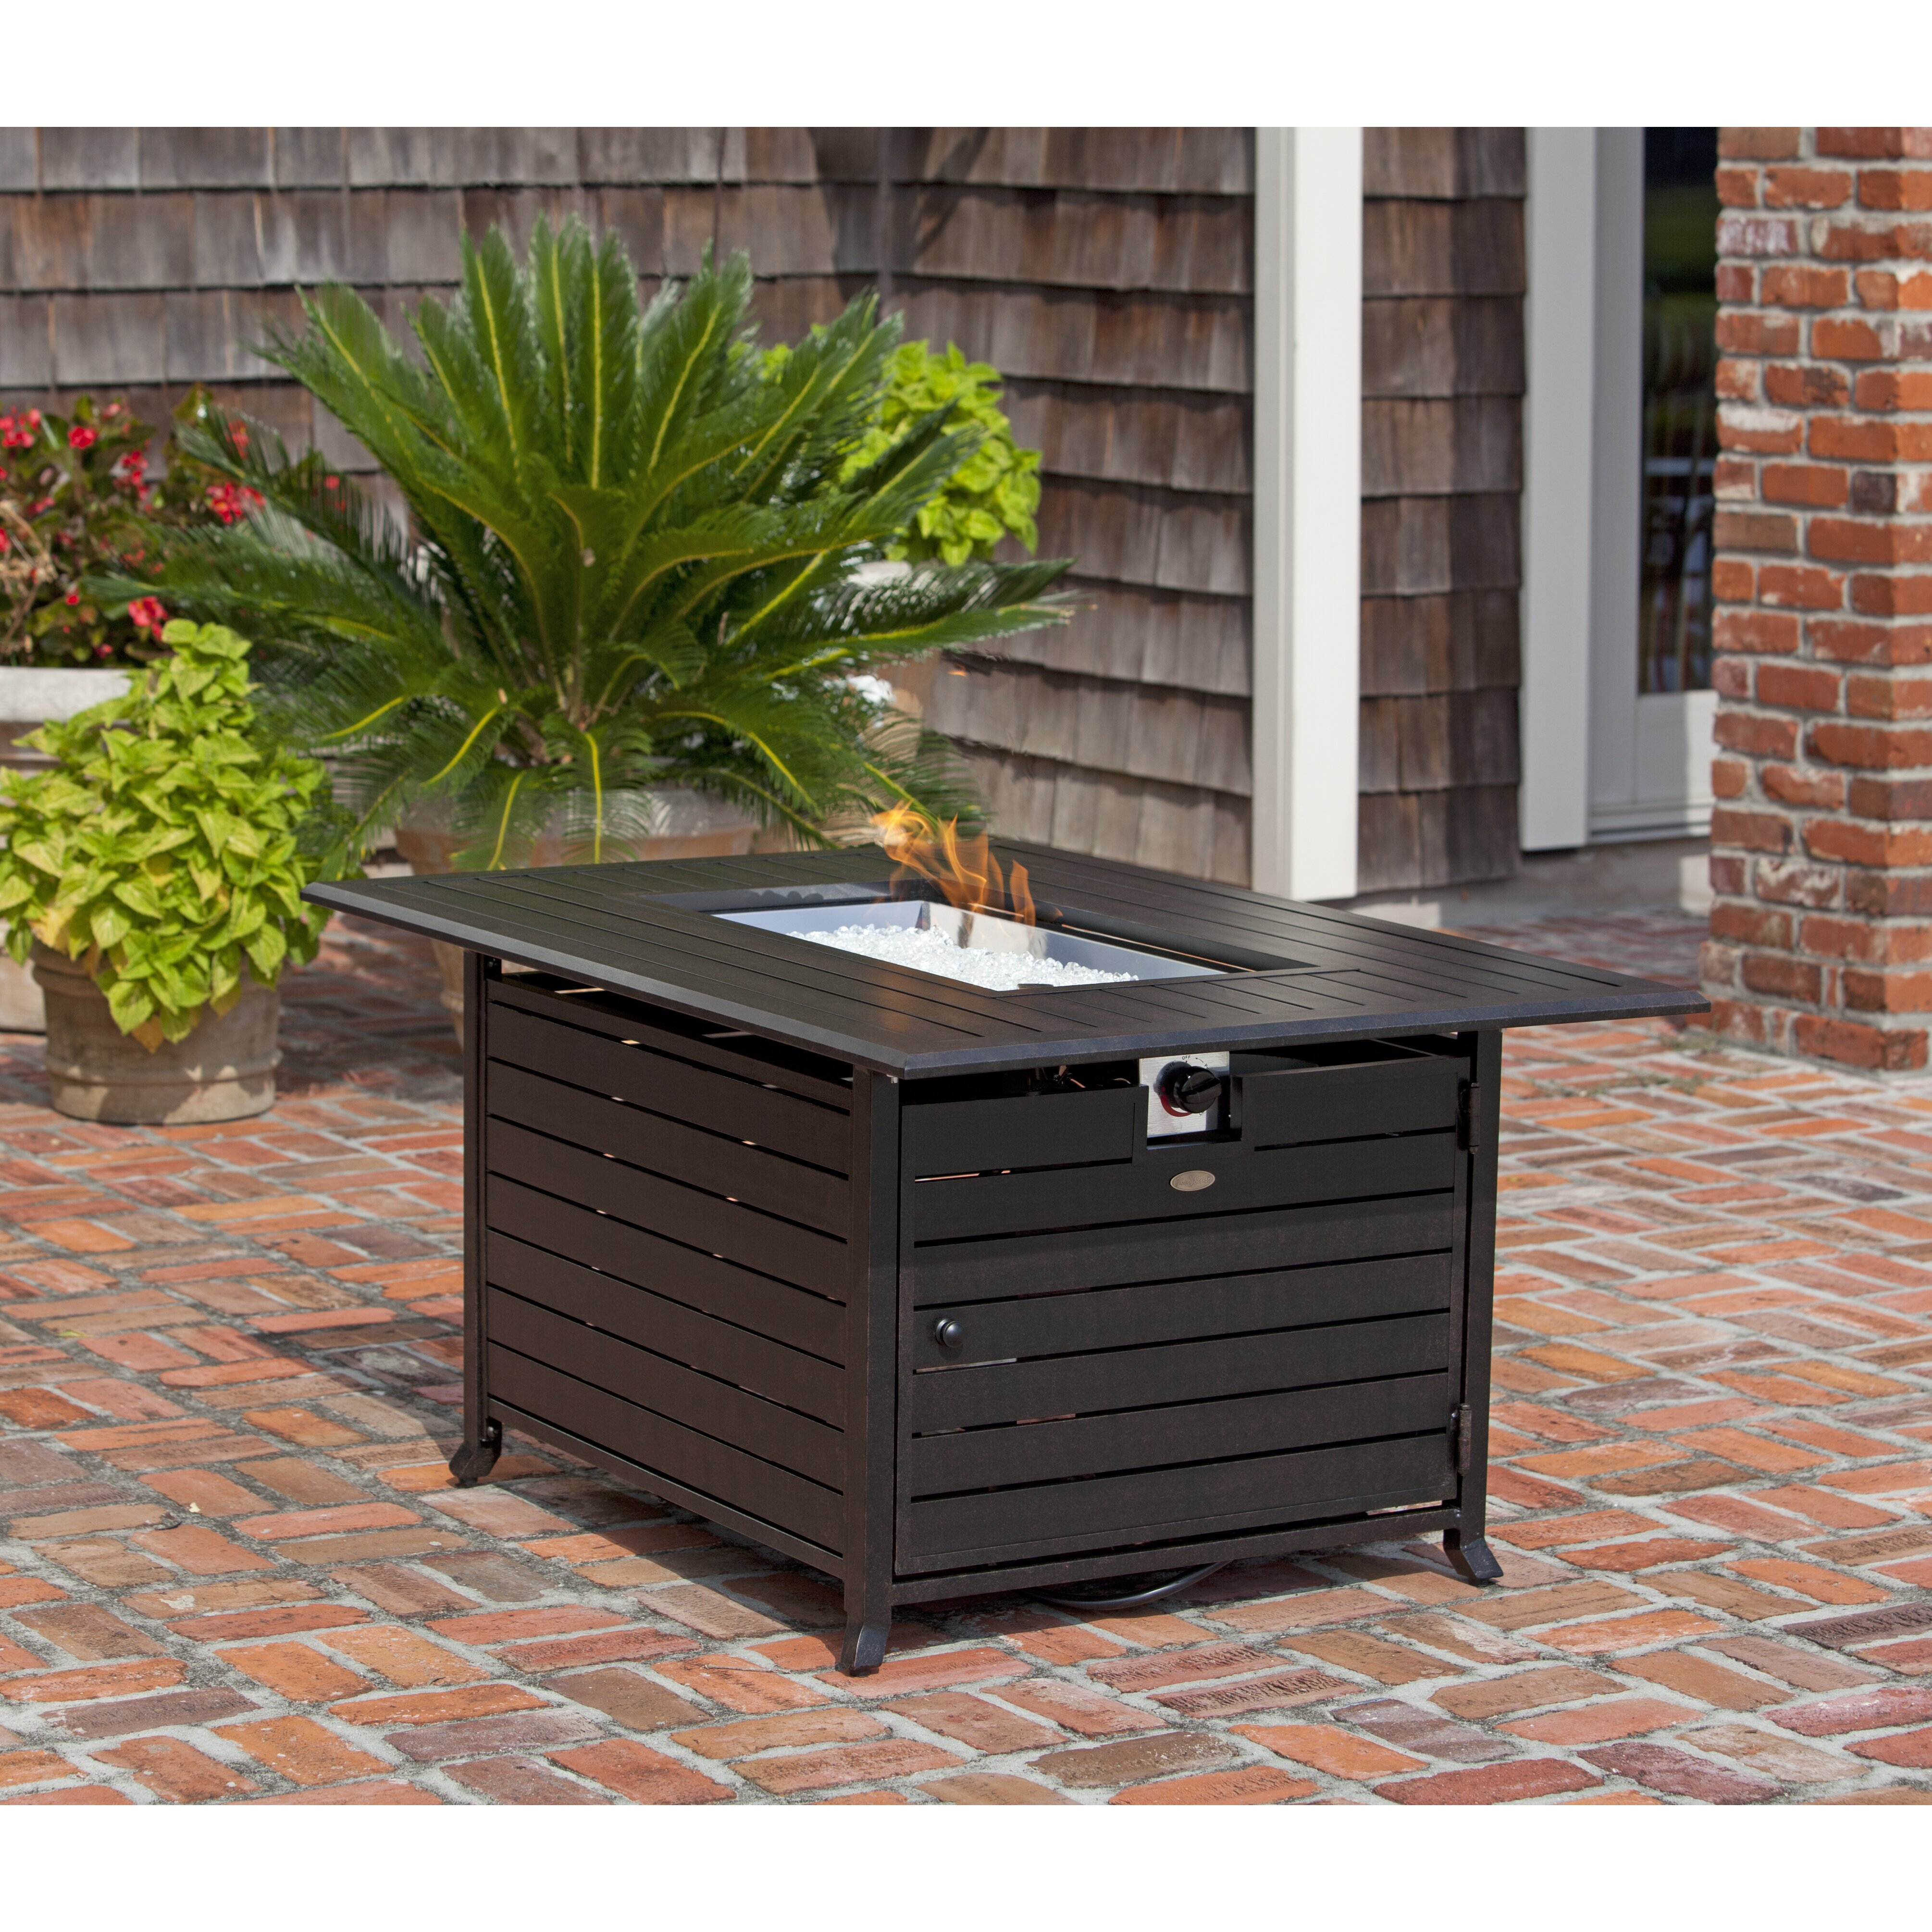 Fire Sense Extruded Aluminum Propane Fire Pit Table ...